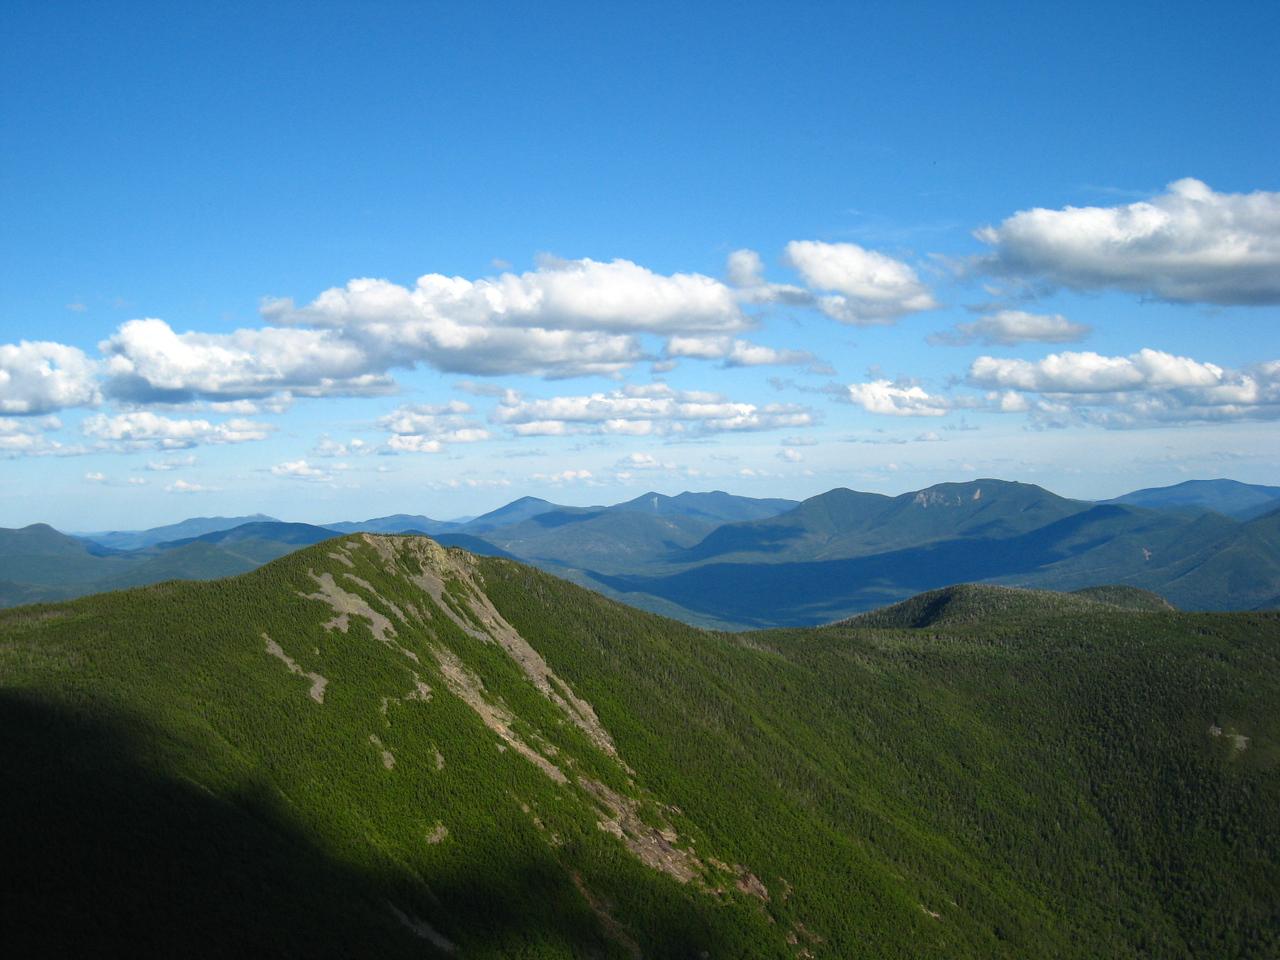 Mt. Flume